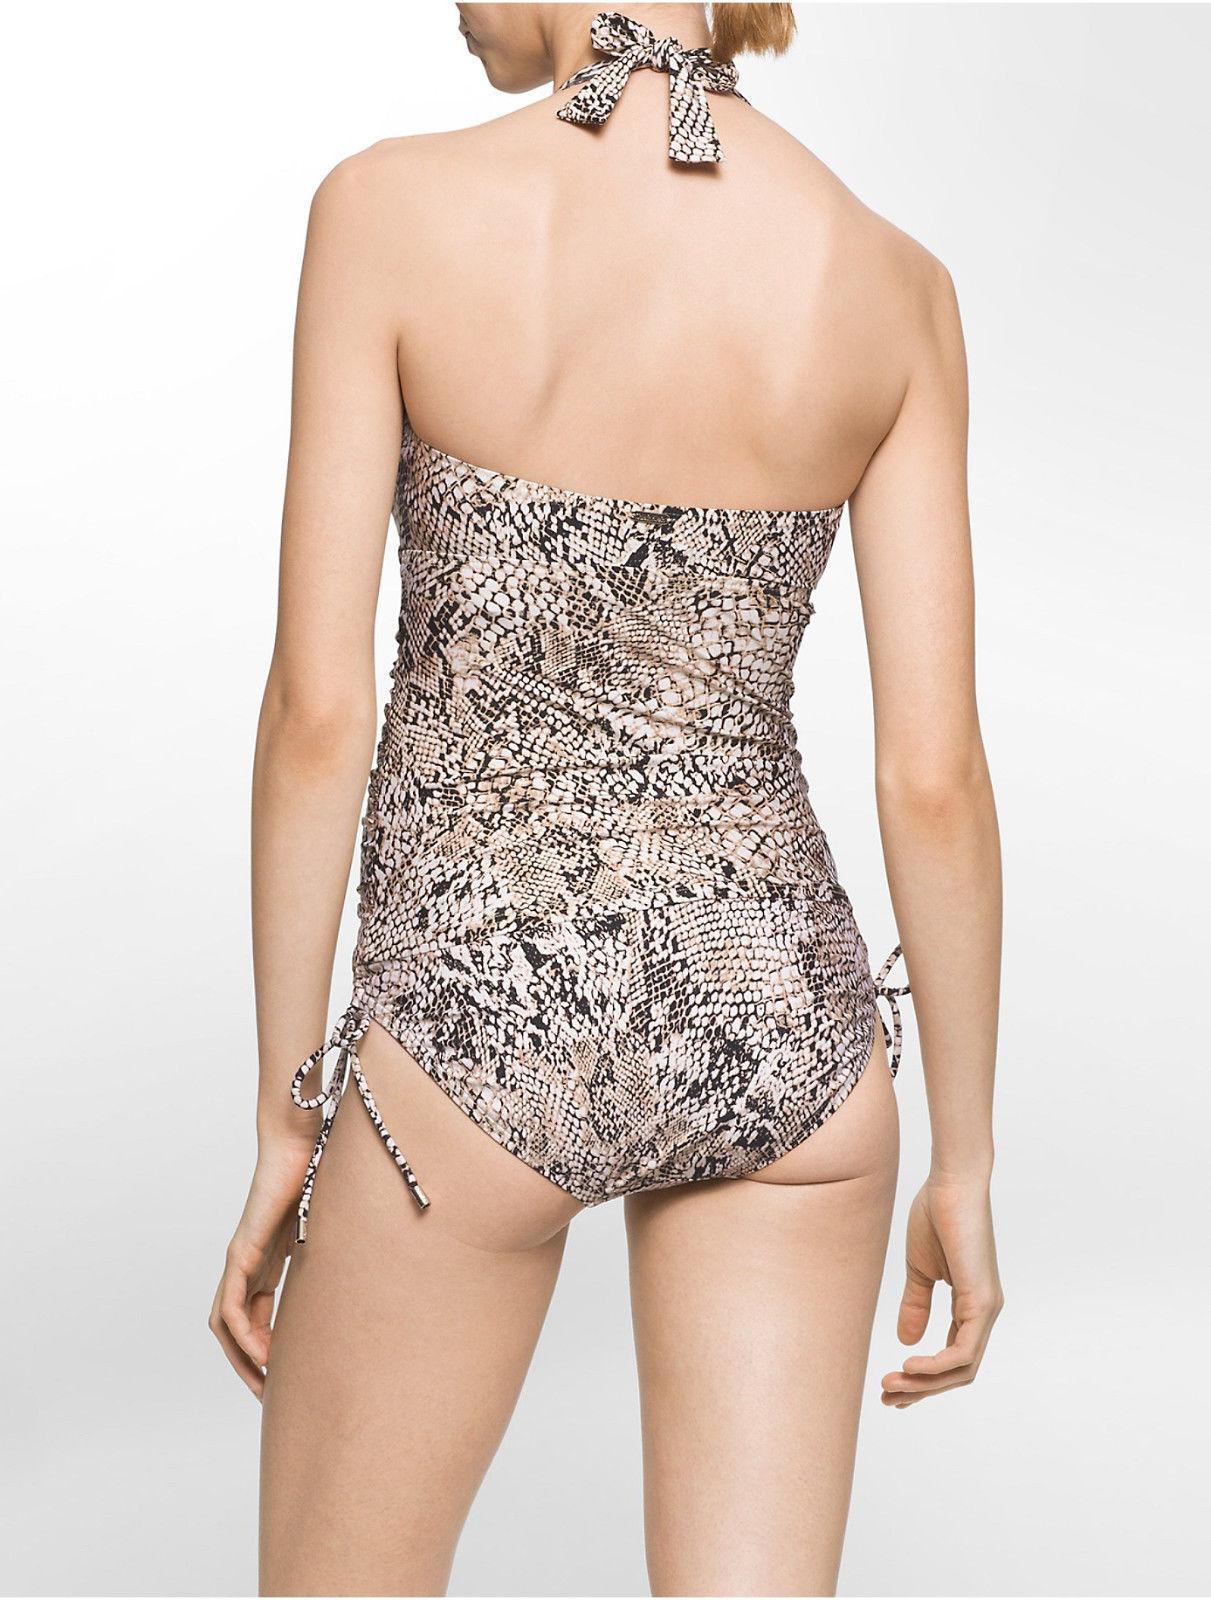 NEW Calvin Klein Snake-Print Side-Tie Swim Bikini Bottoms M Medium $68 CG6BD089